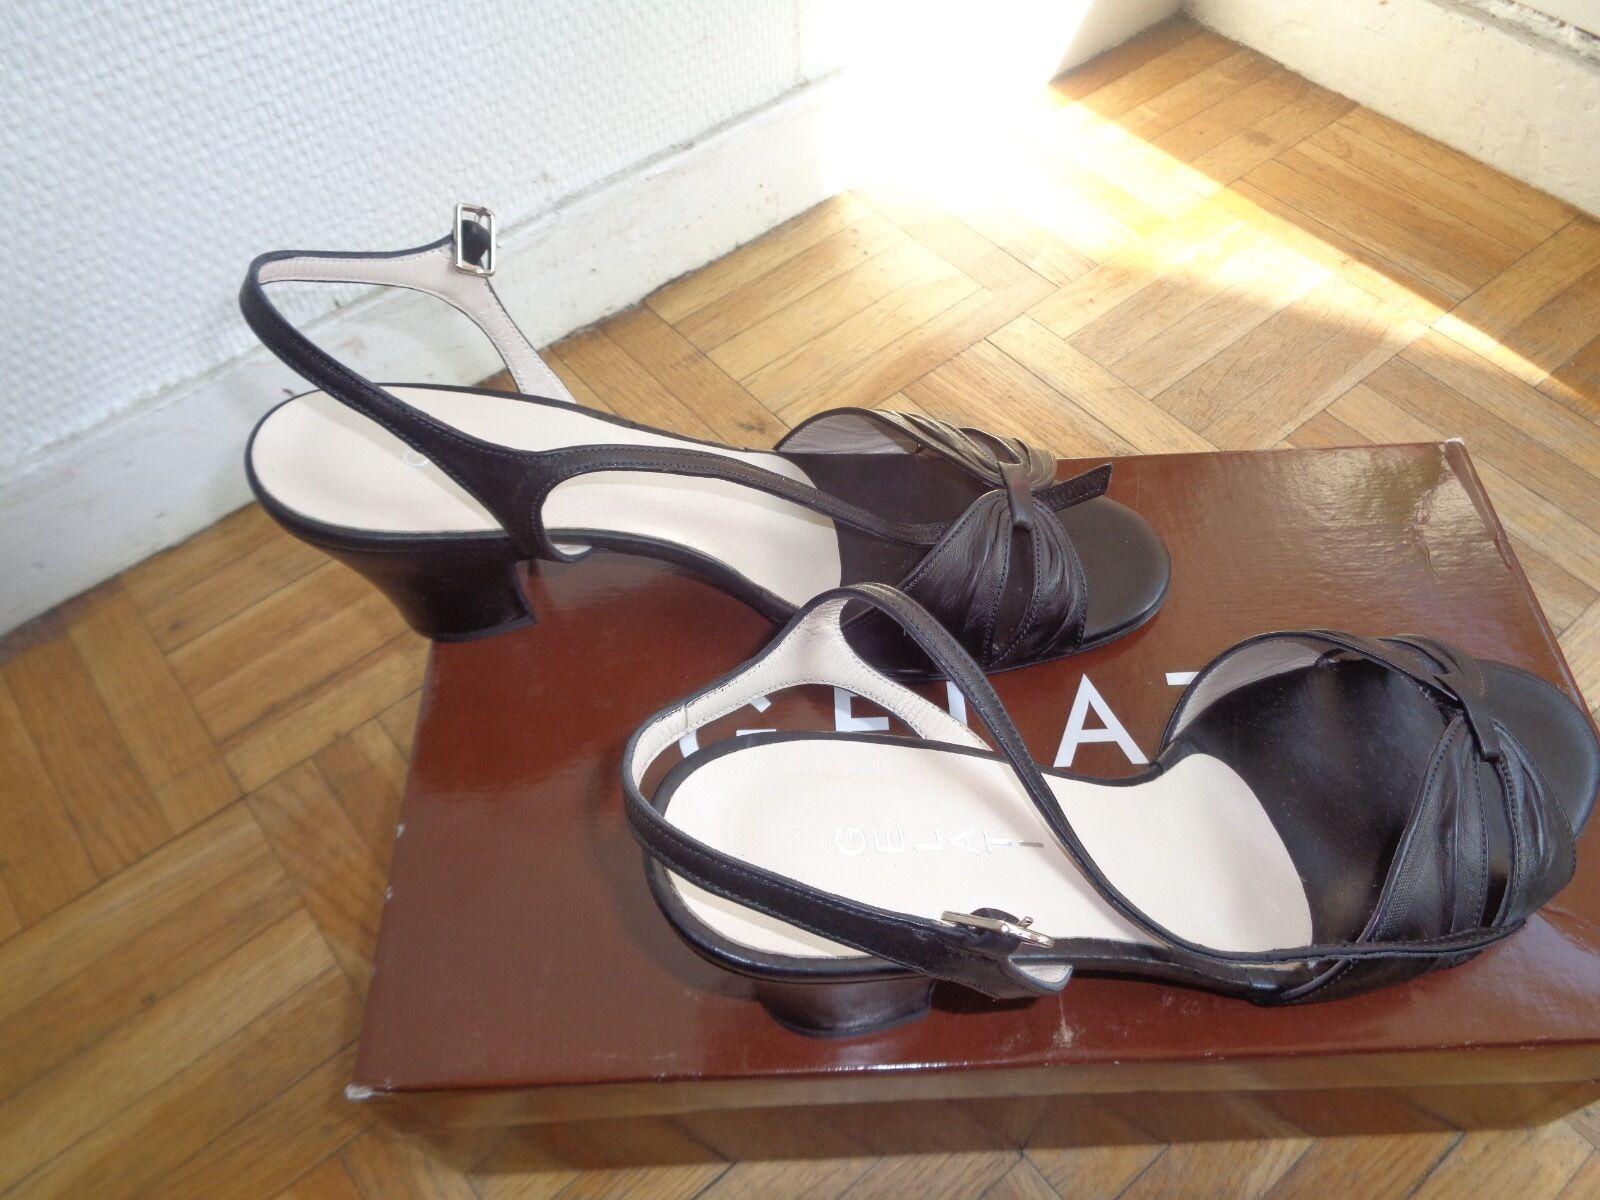 Chaussures sandales femme noires Gelati neuves T37 1 2